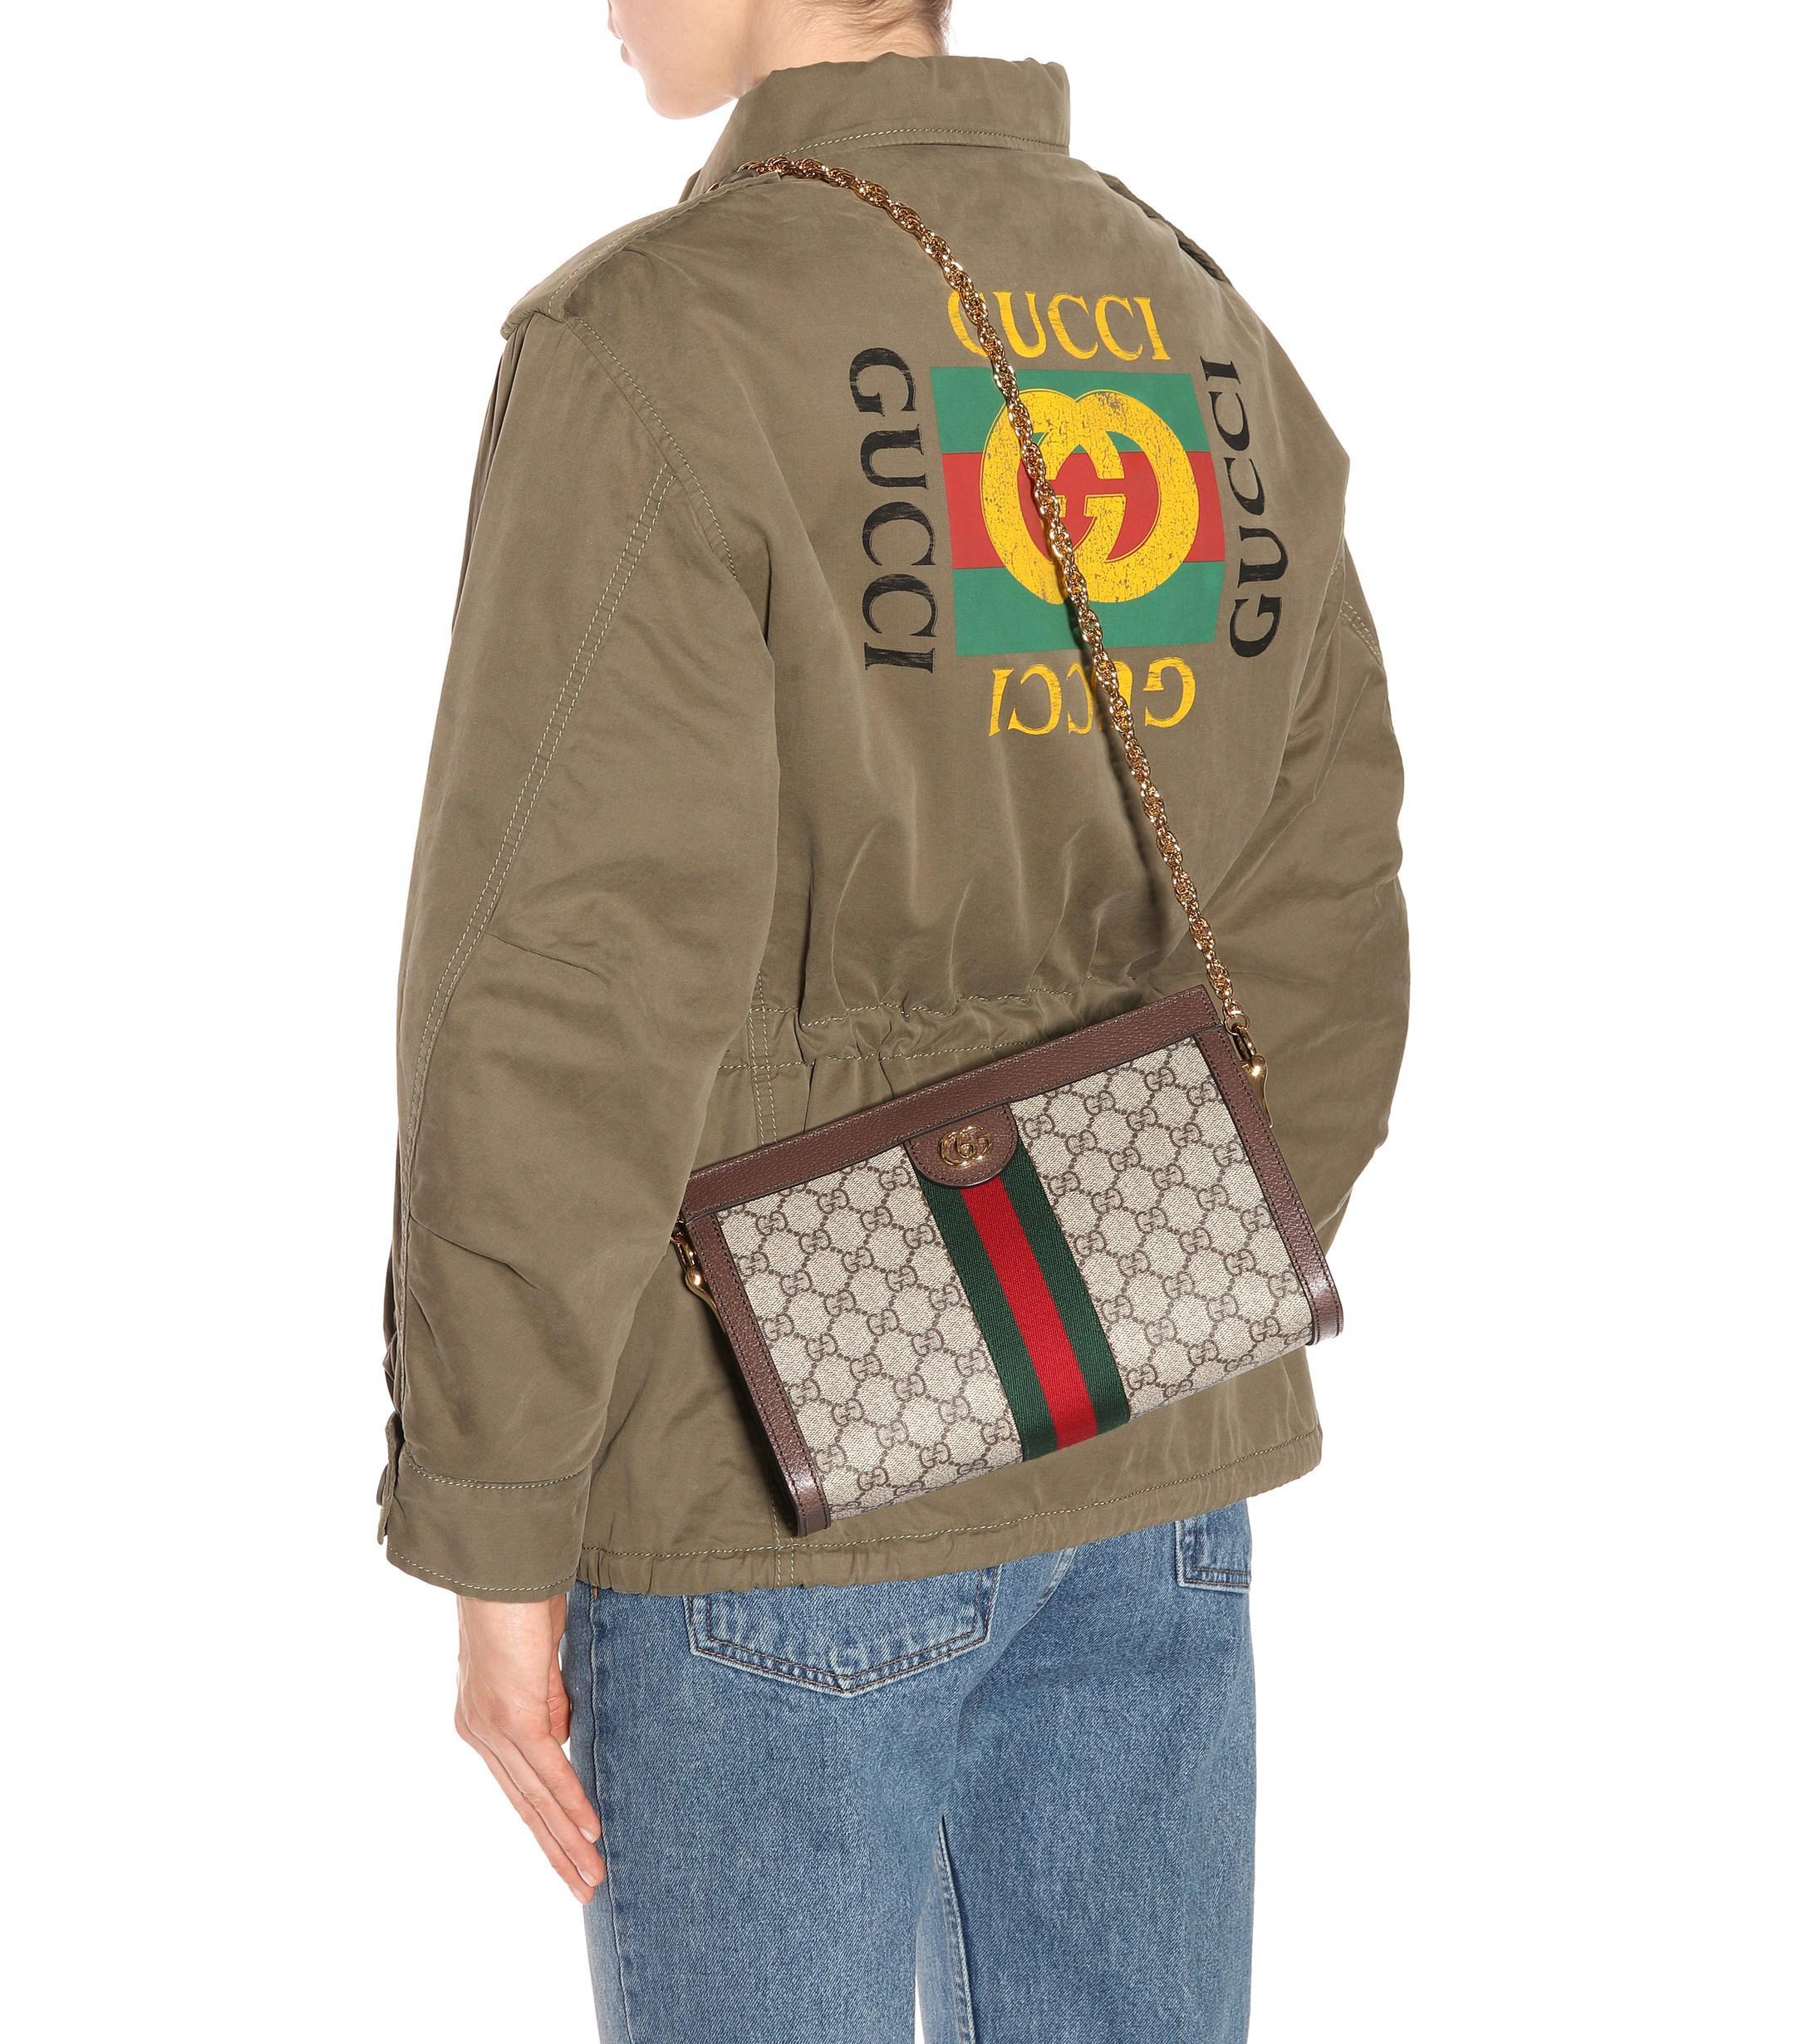 218f4b681399 Gucci - Multicolor Ophidia GG Small Shoulder Bag - Lyst. View fullscreen